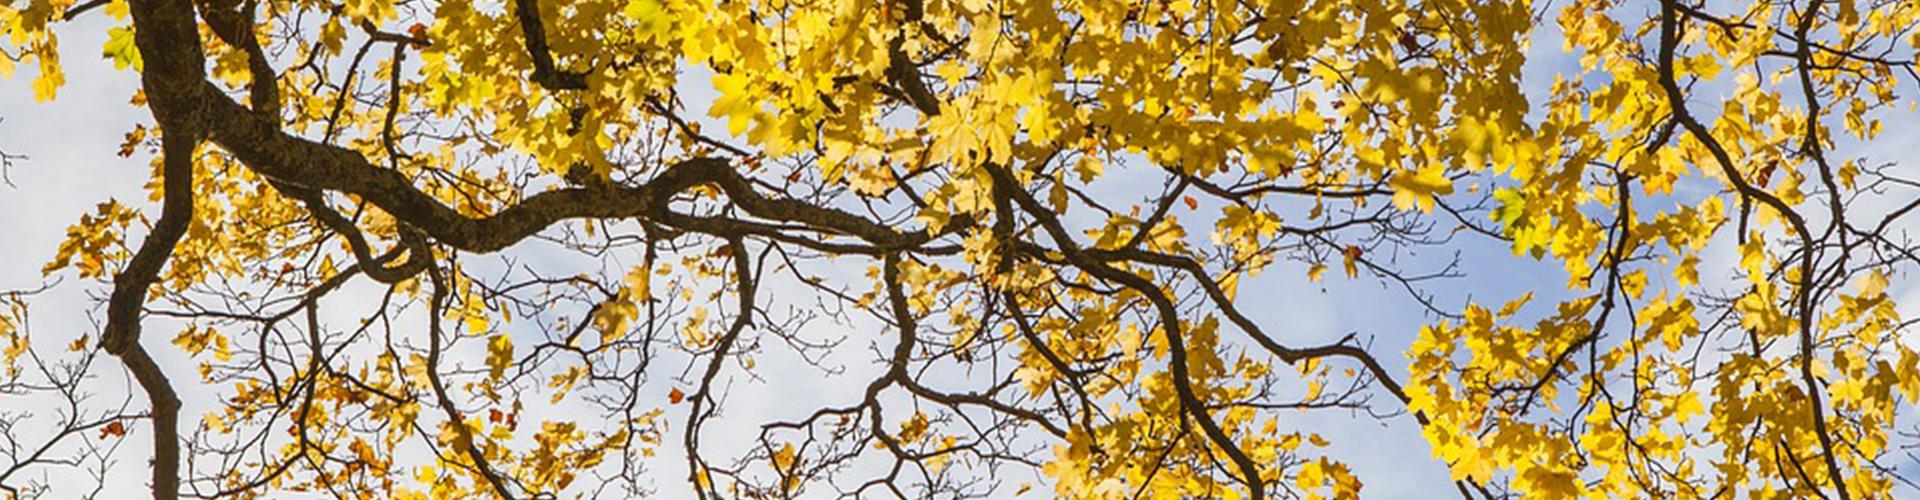 gardening-autumn-main.jpg